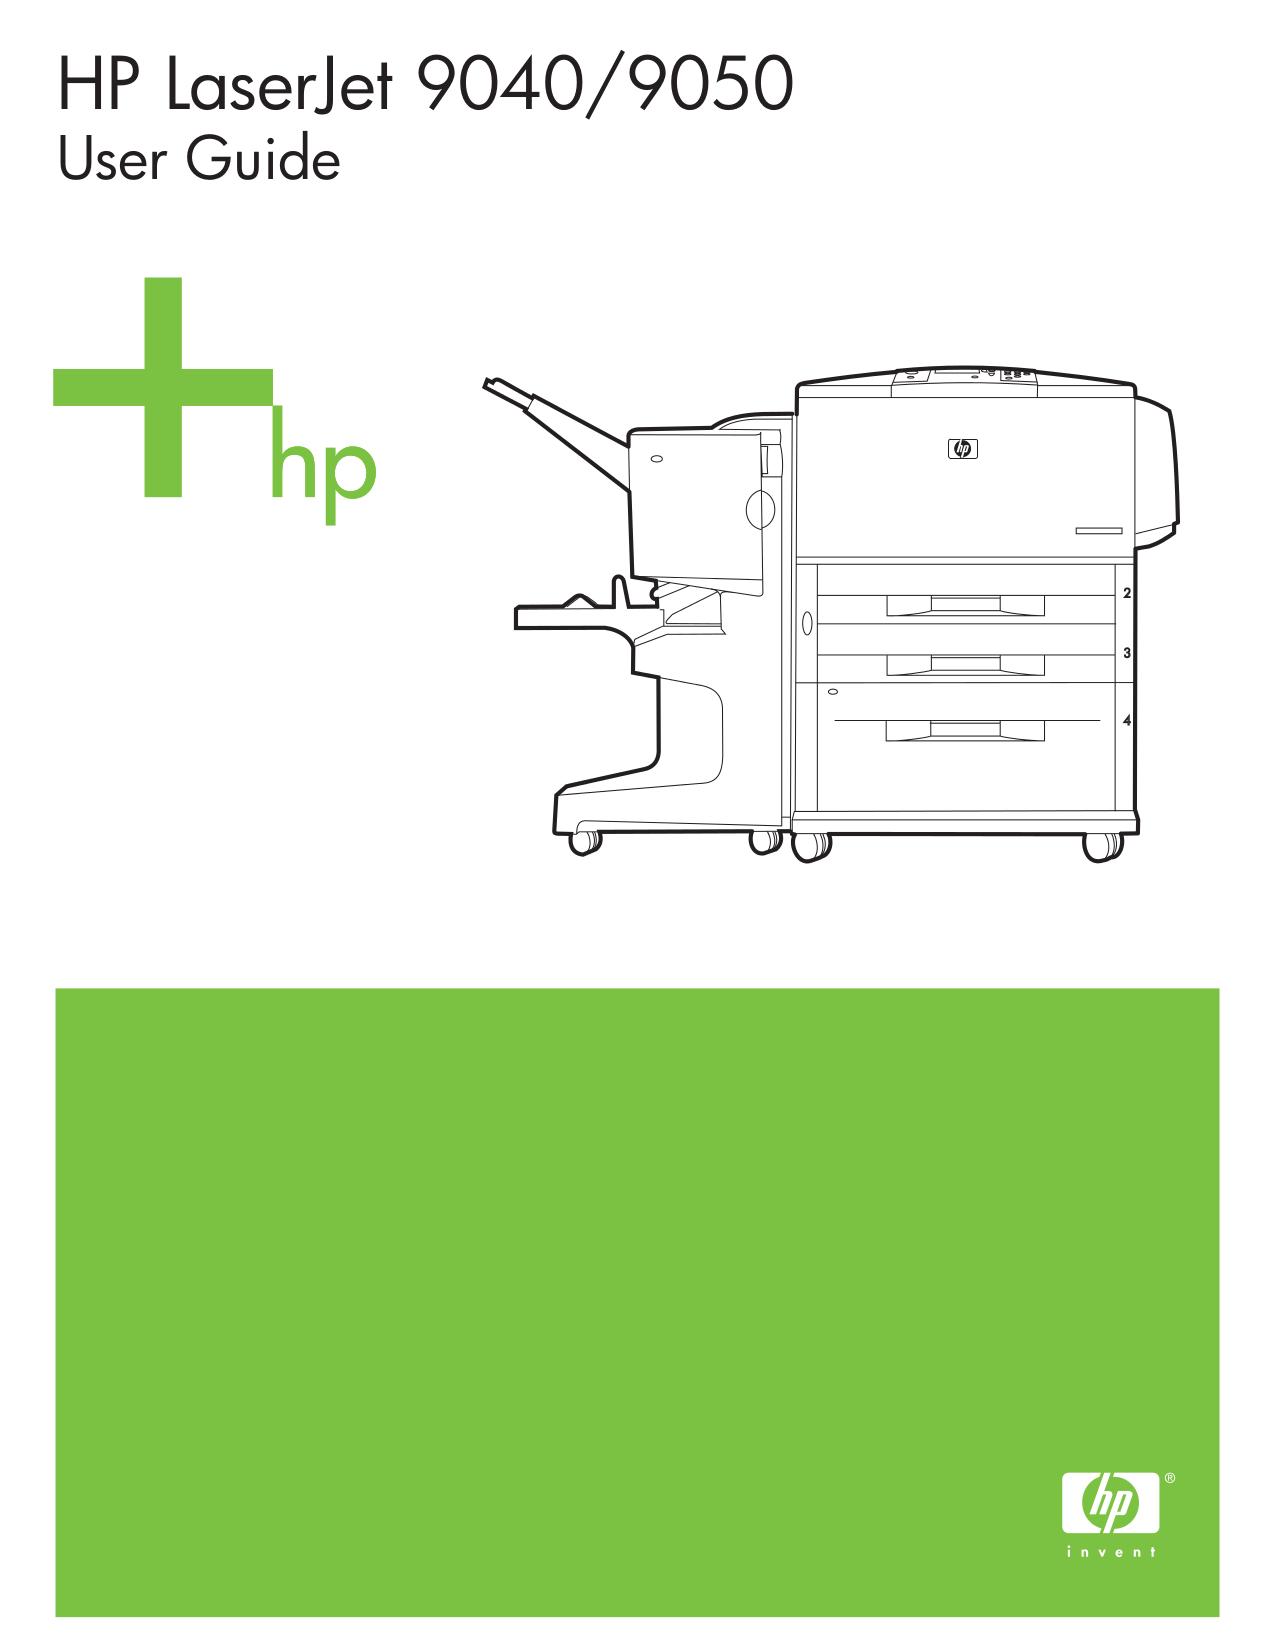 Laserjet 3600 service Manual pdf